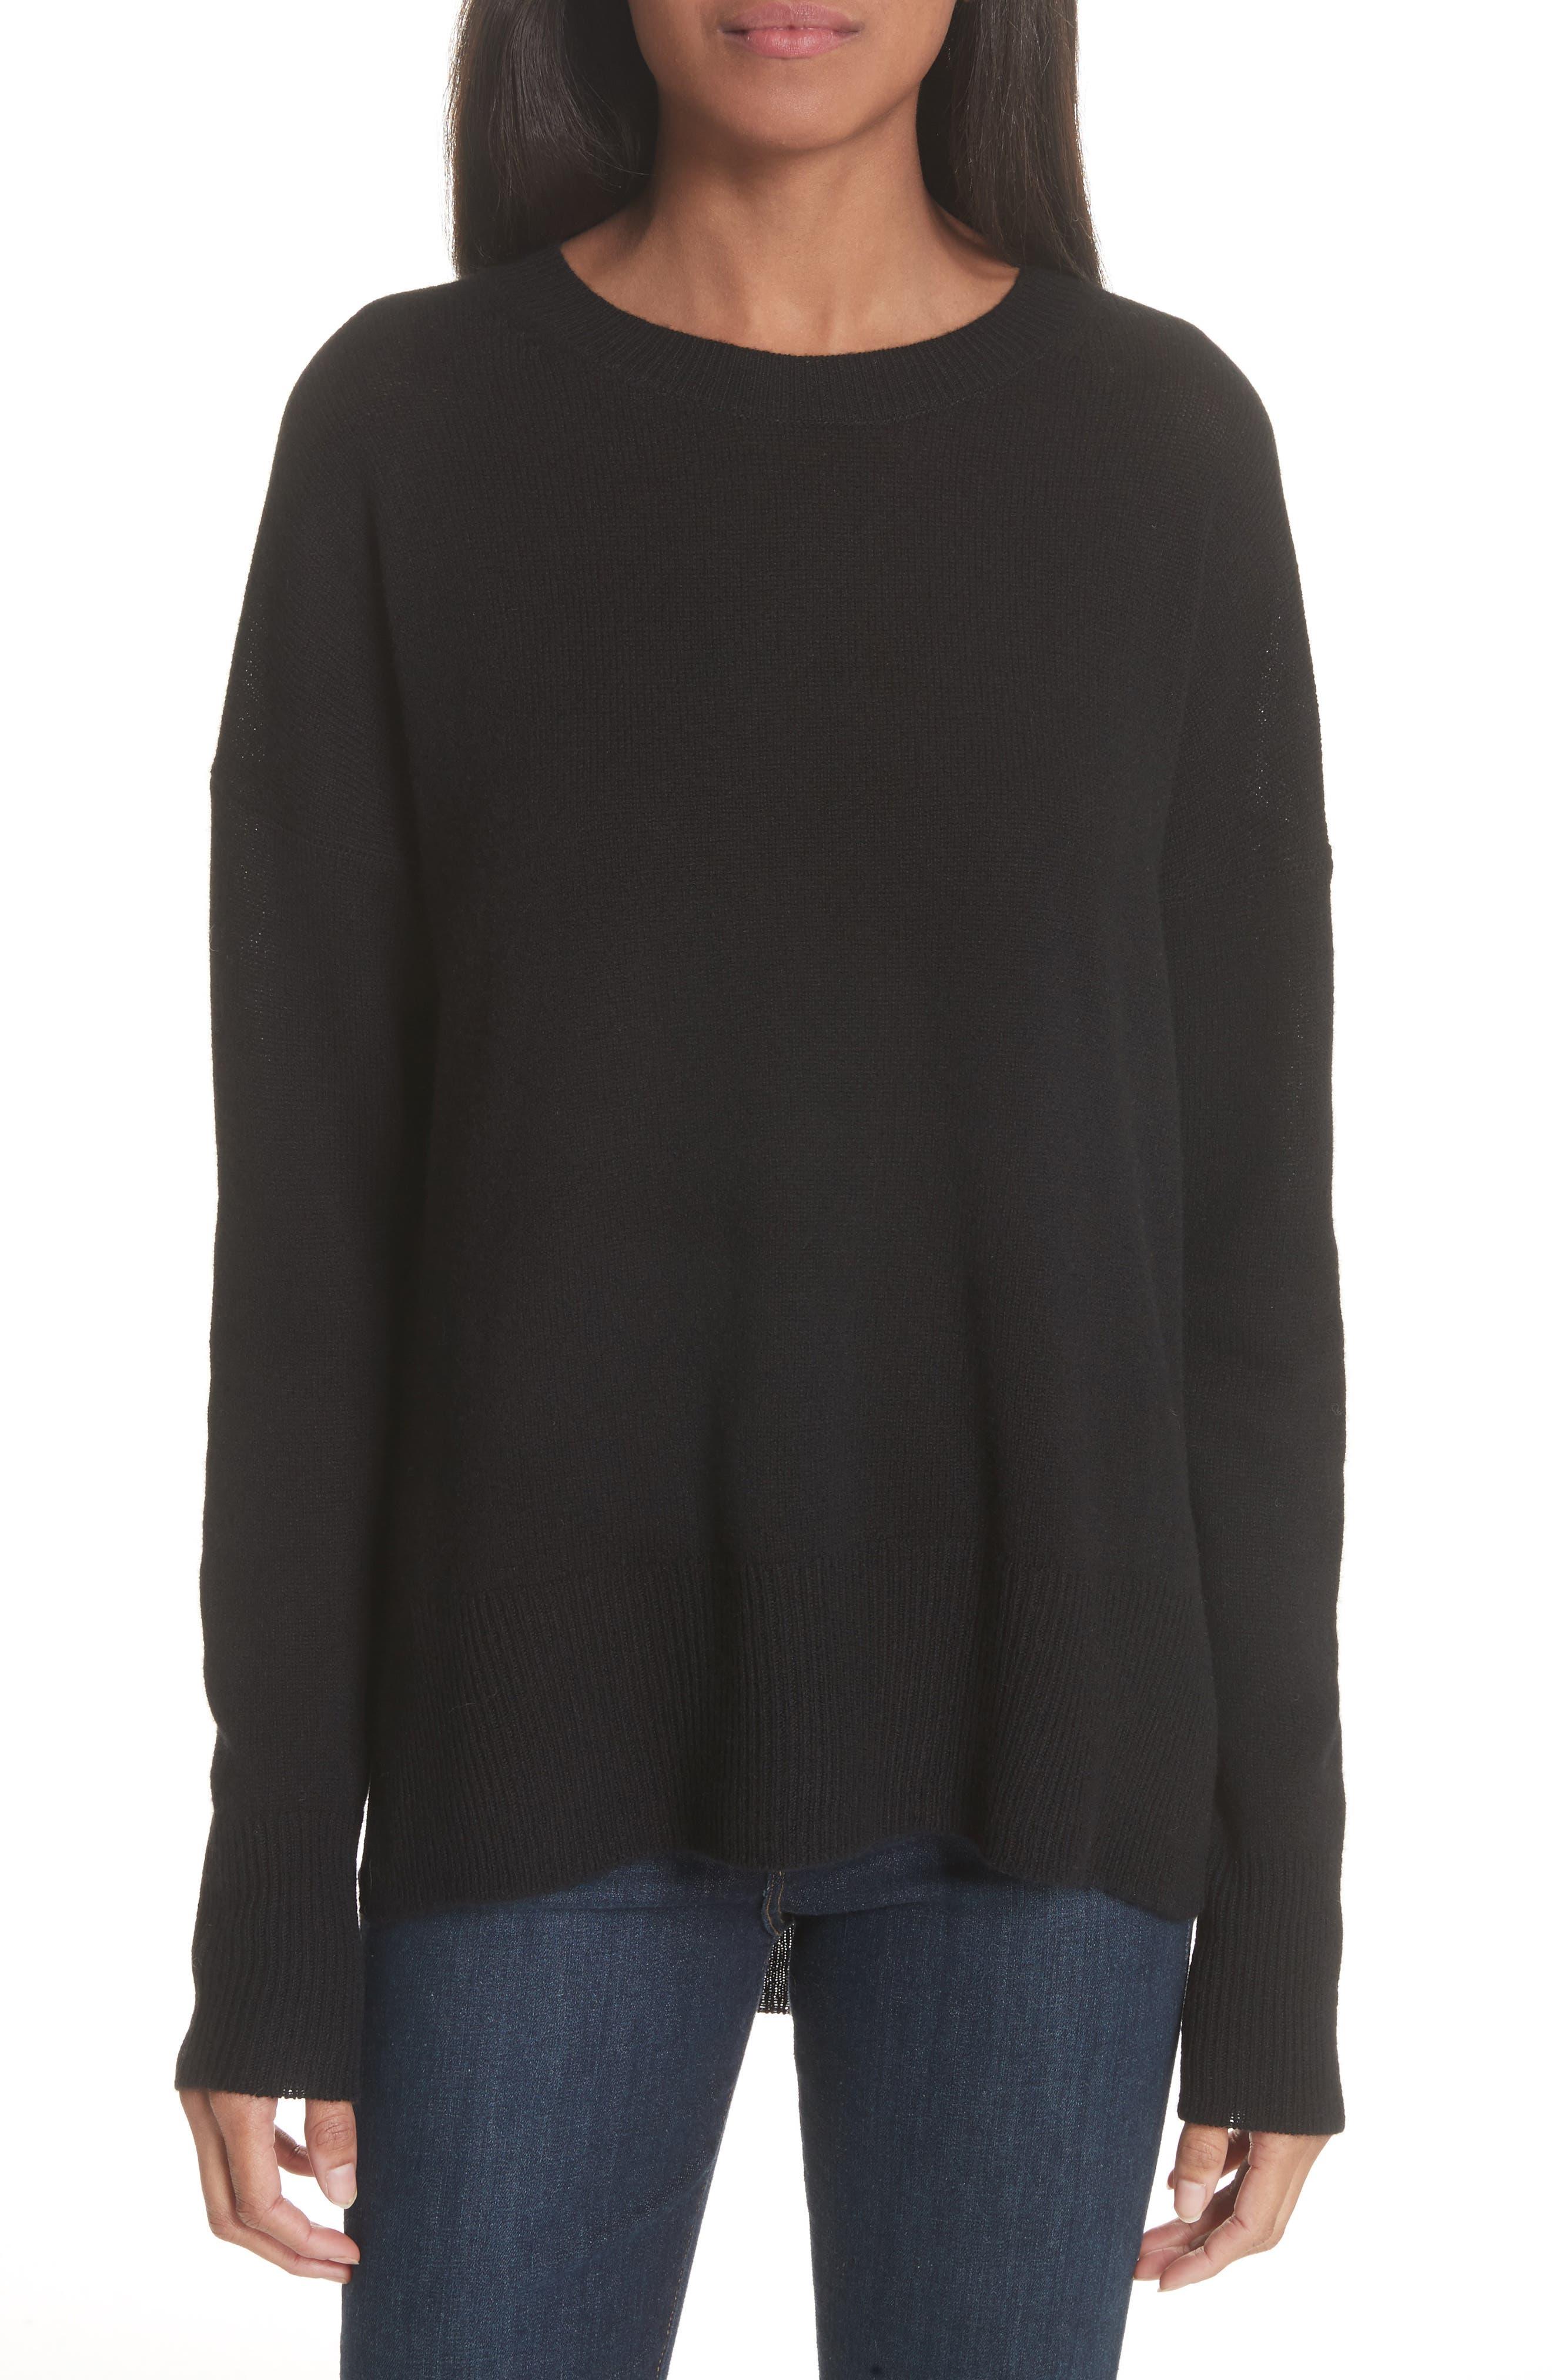 THEORY Karenia L Cashmere Sweater, Main, color, 001